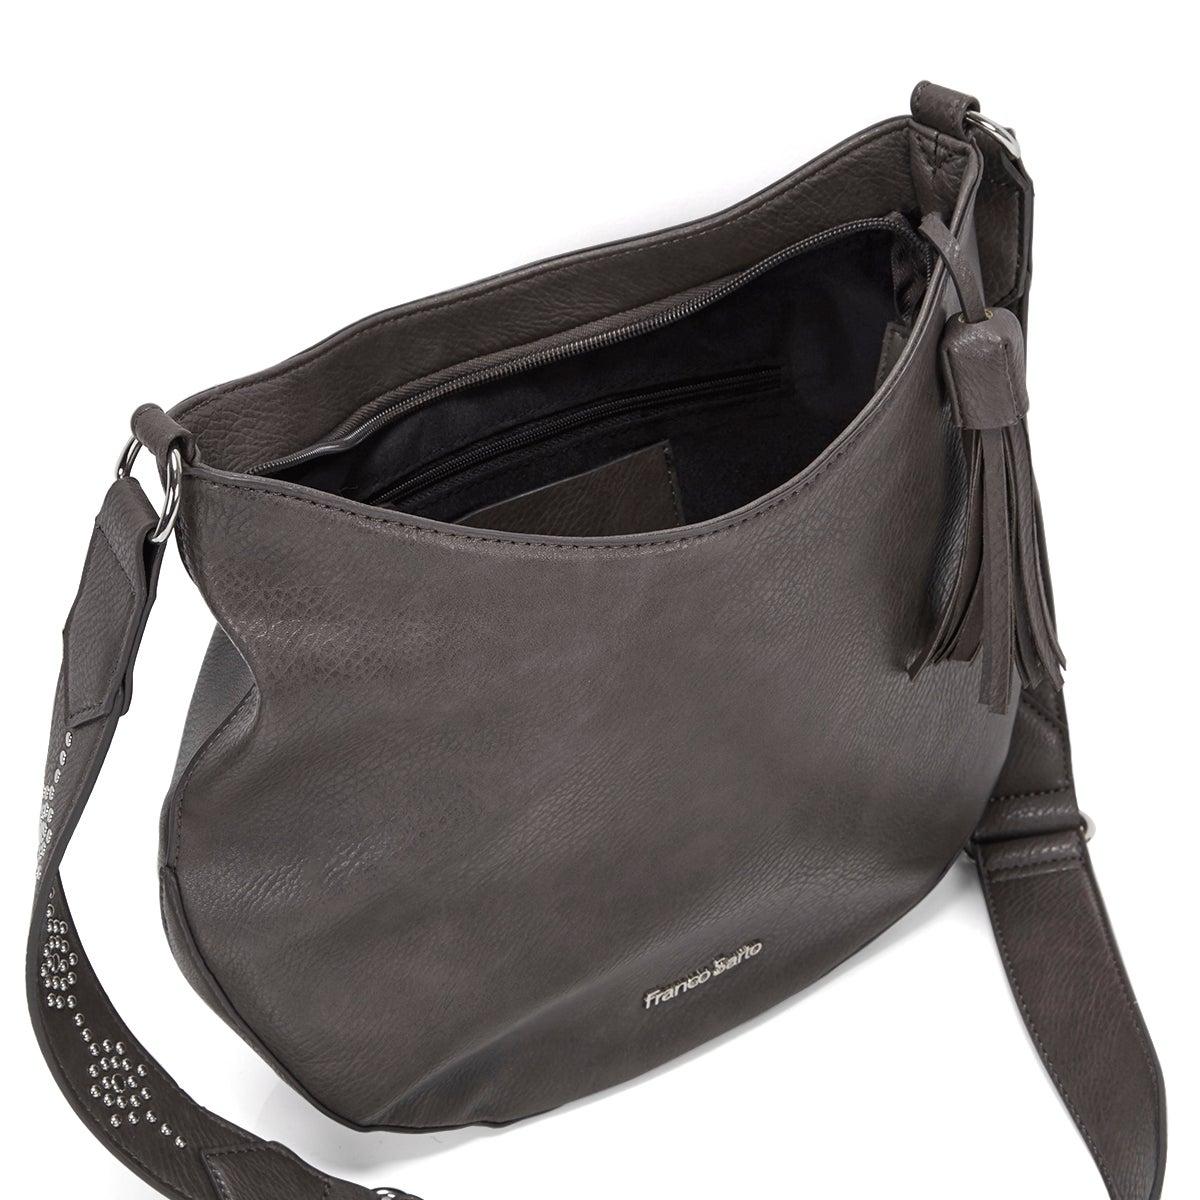 Lds Eva grey cross body bag